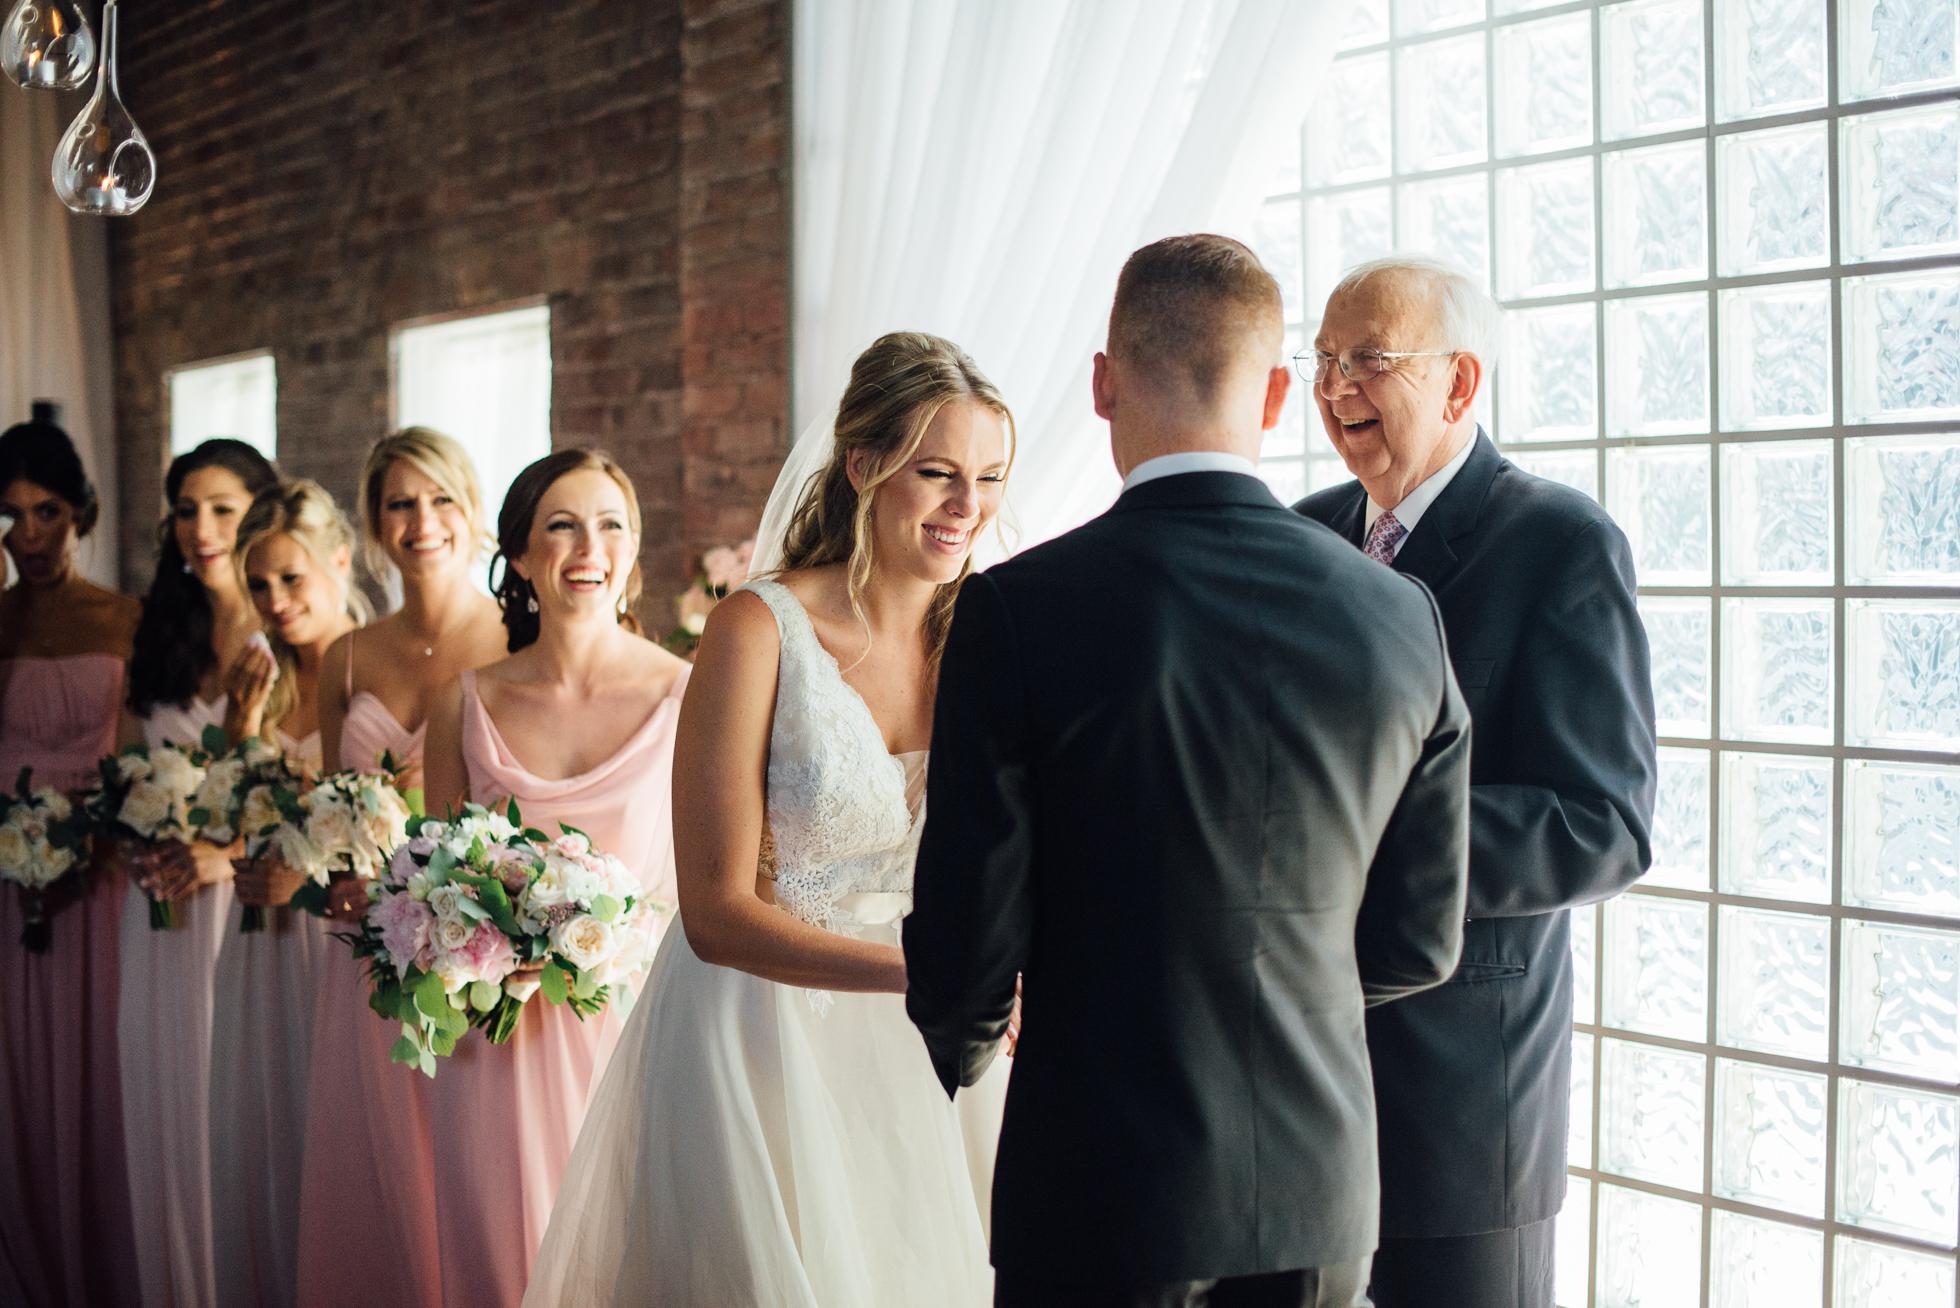 99-Sudbury-Toronto-Wedding-Photography-21.jpg